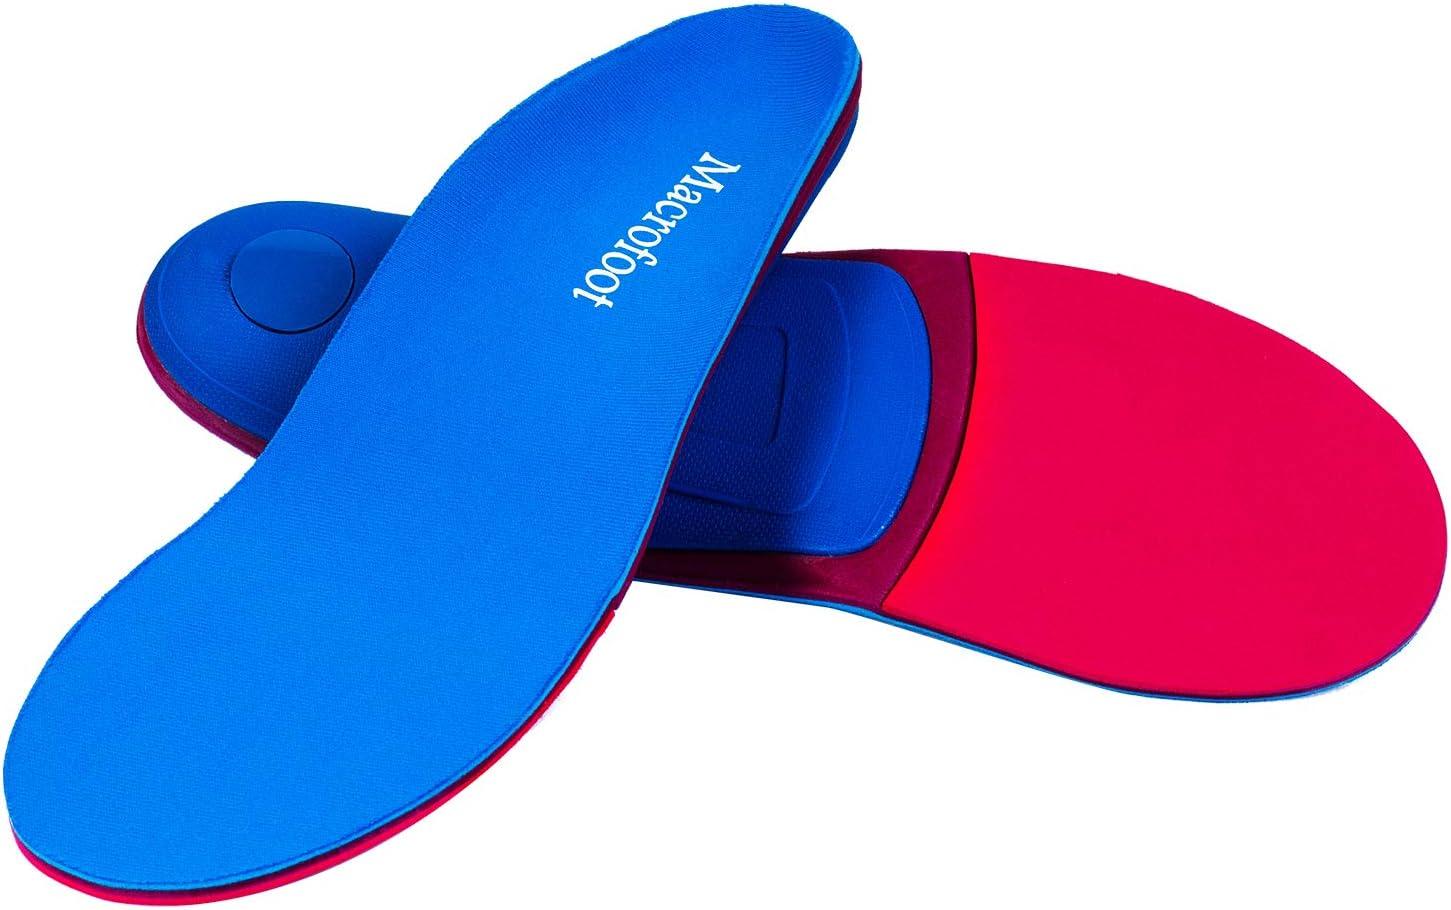 Orthotics Shoe Insoles/Inserts/Pads